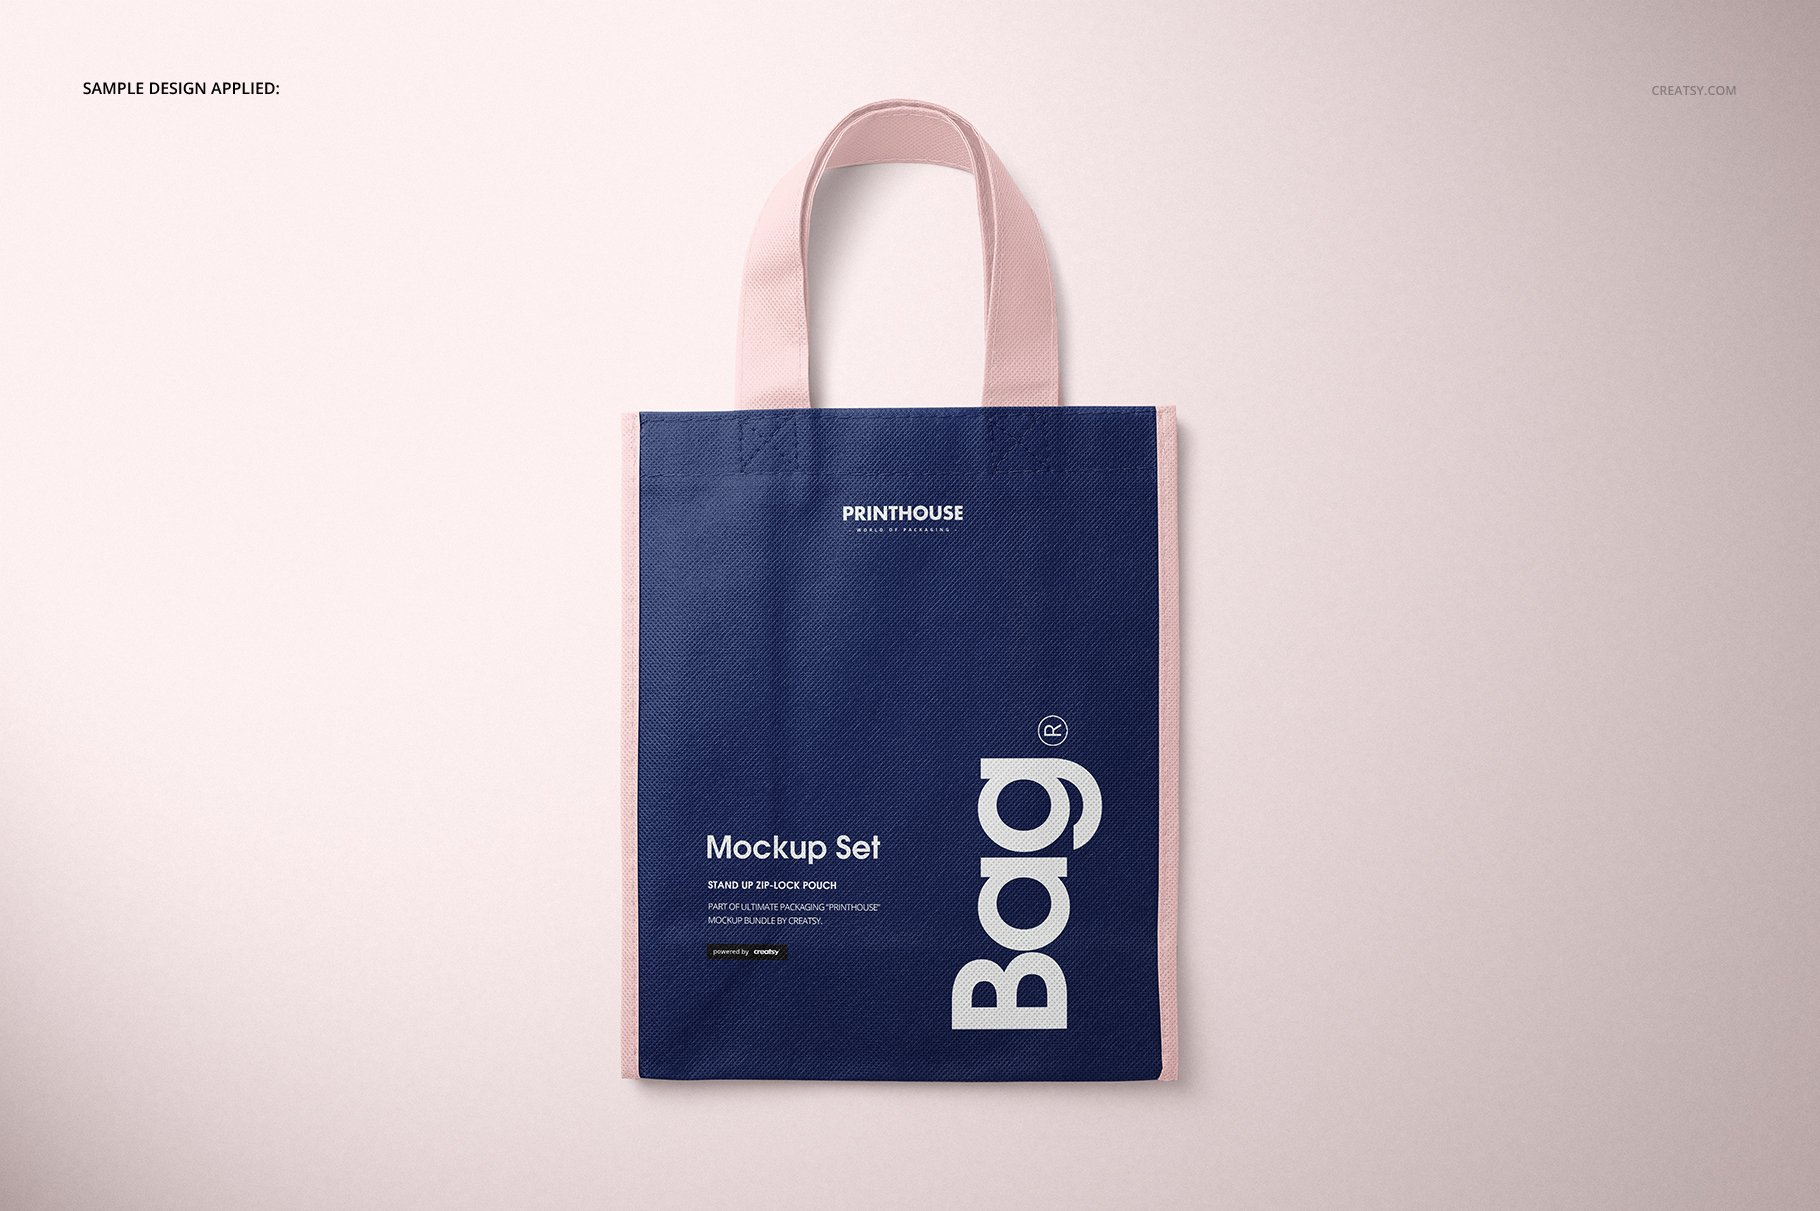 [淘宝购买] 无纺布袋手提袋设计展示样机模板套装 Non-Woven Tote Bag Mockup Set插图(6)